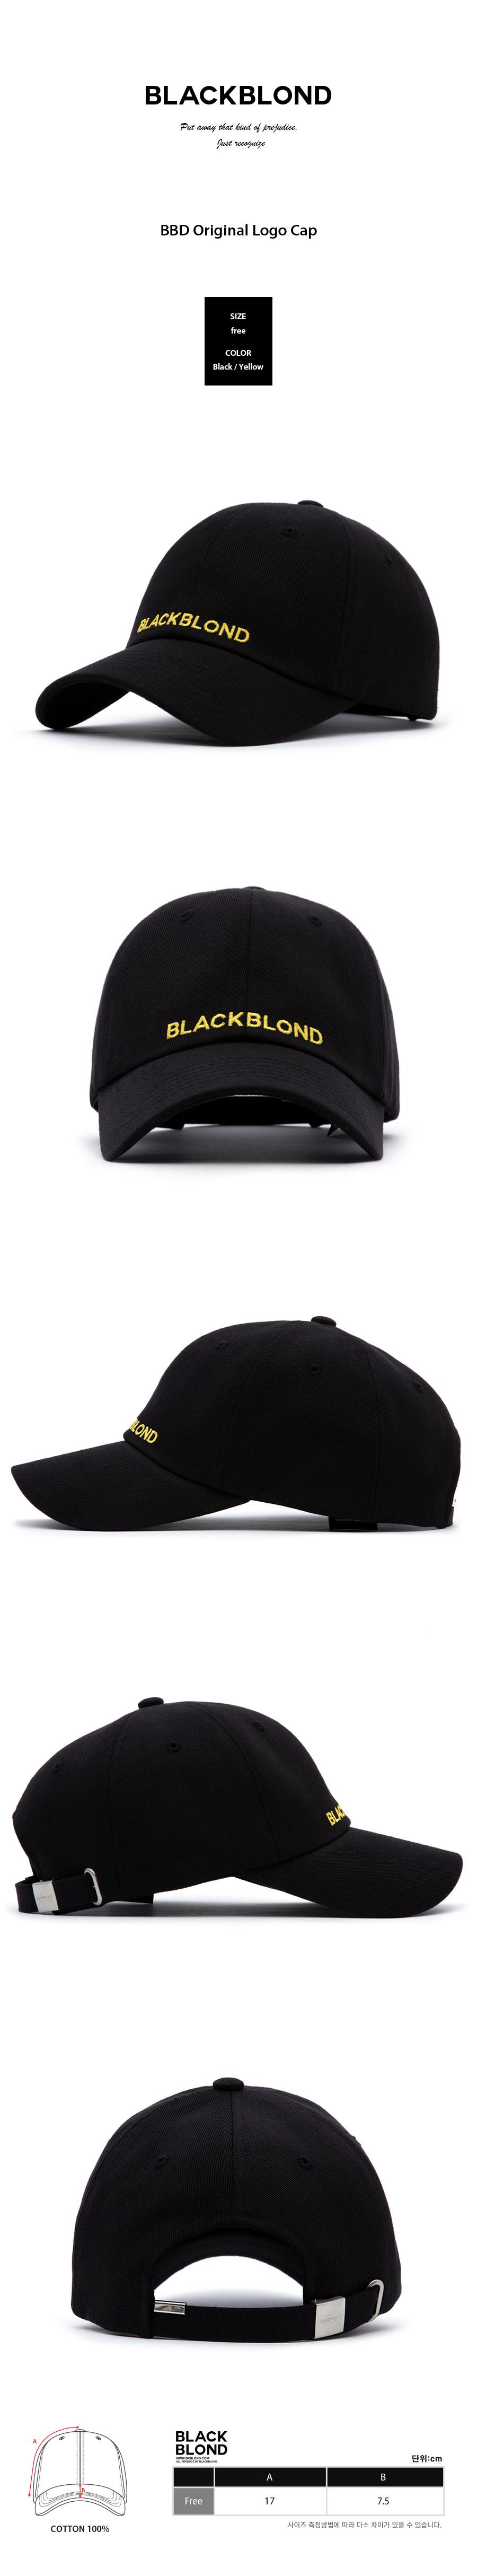 BBD-Original-Logo-Cap-%28Black_Yellow%29.jpg